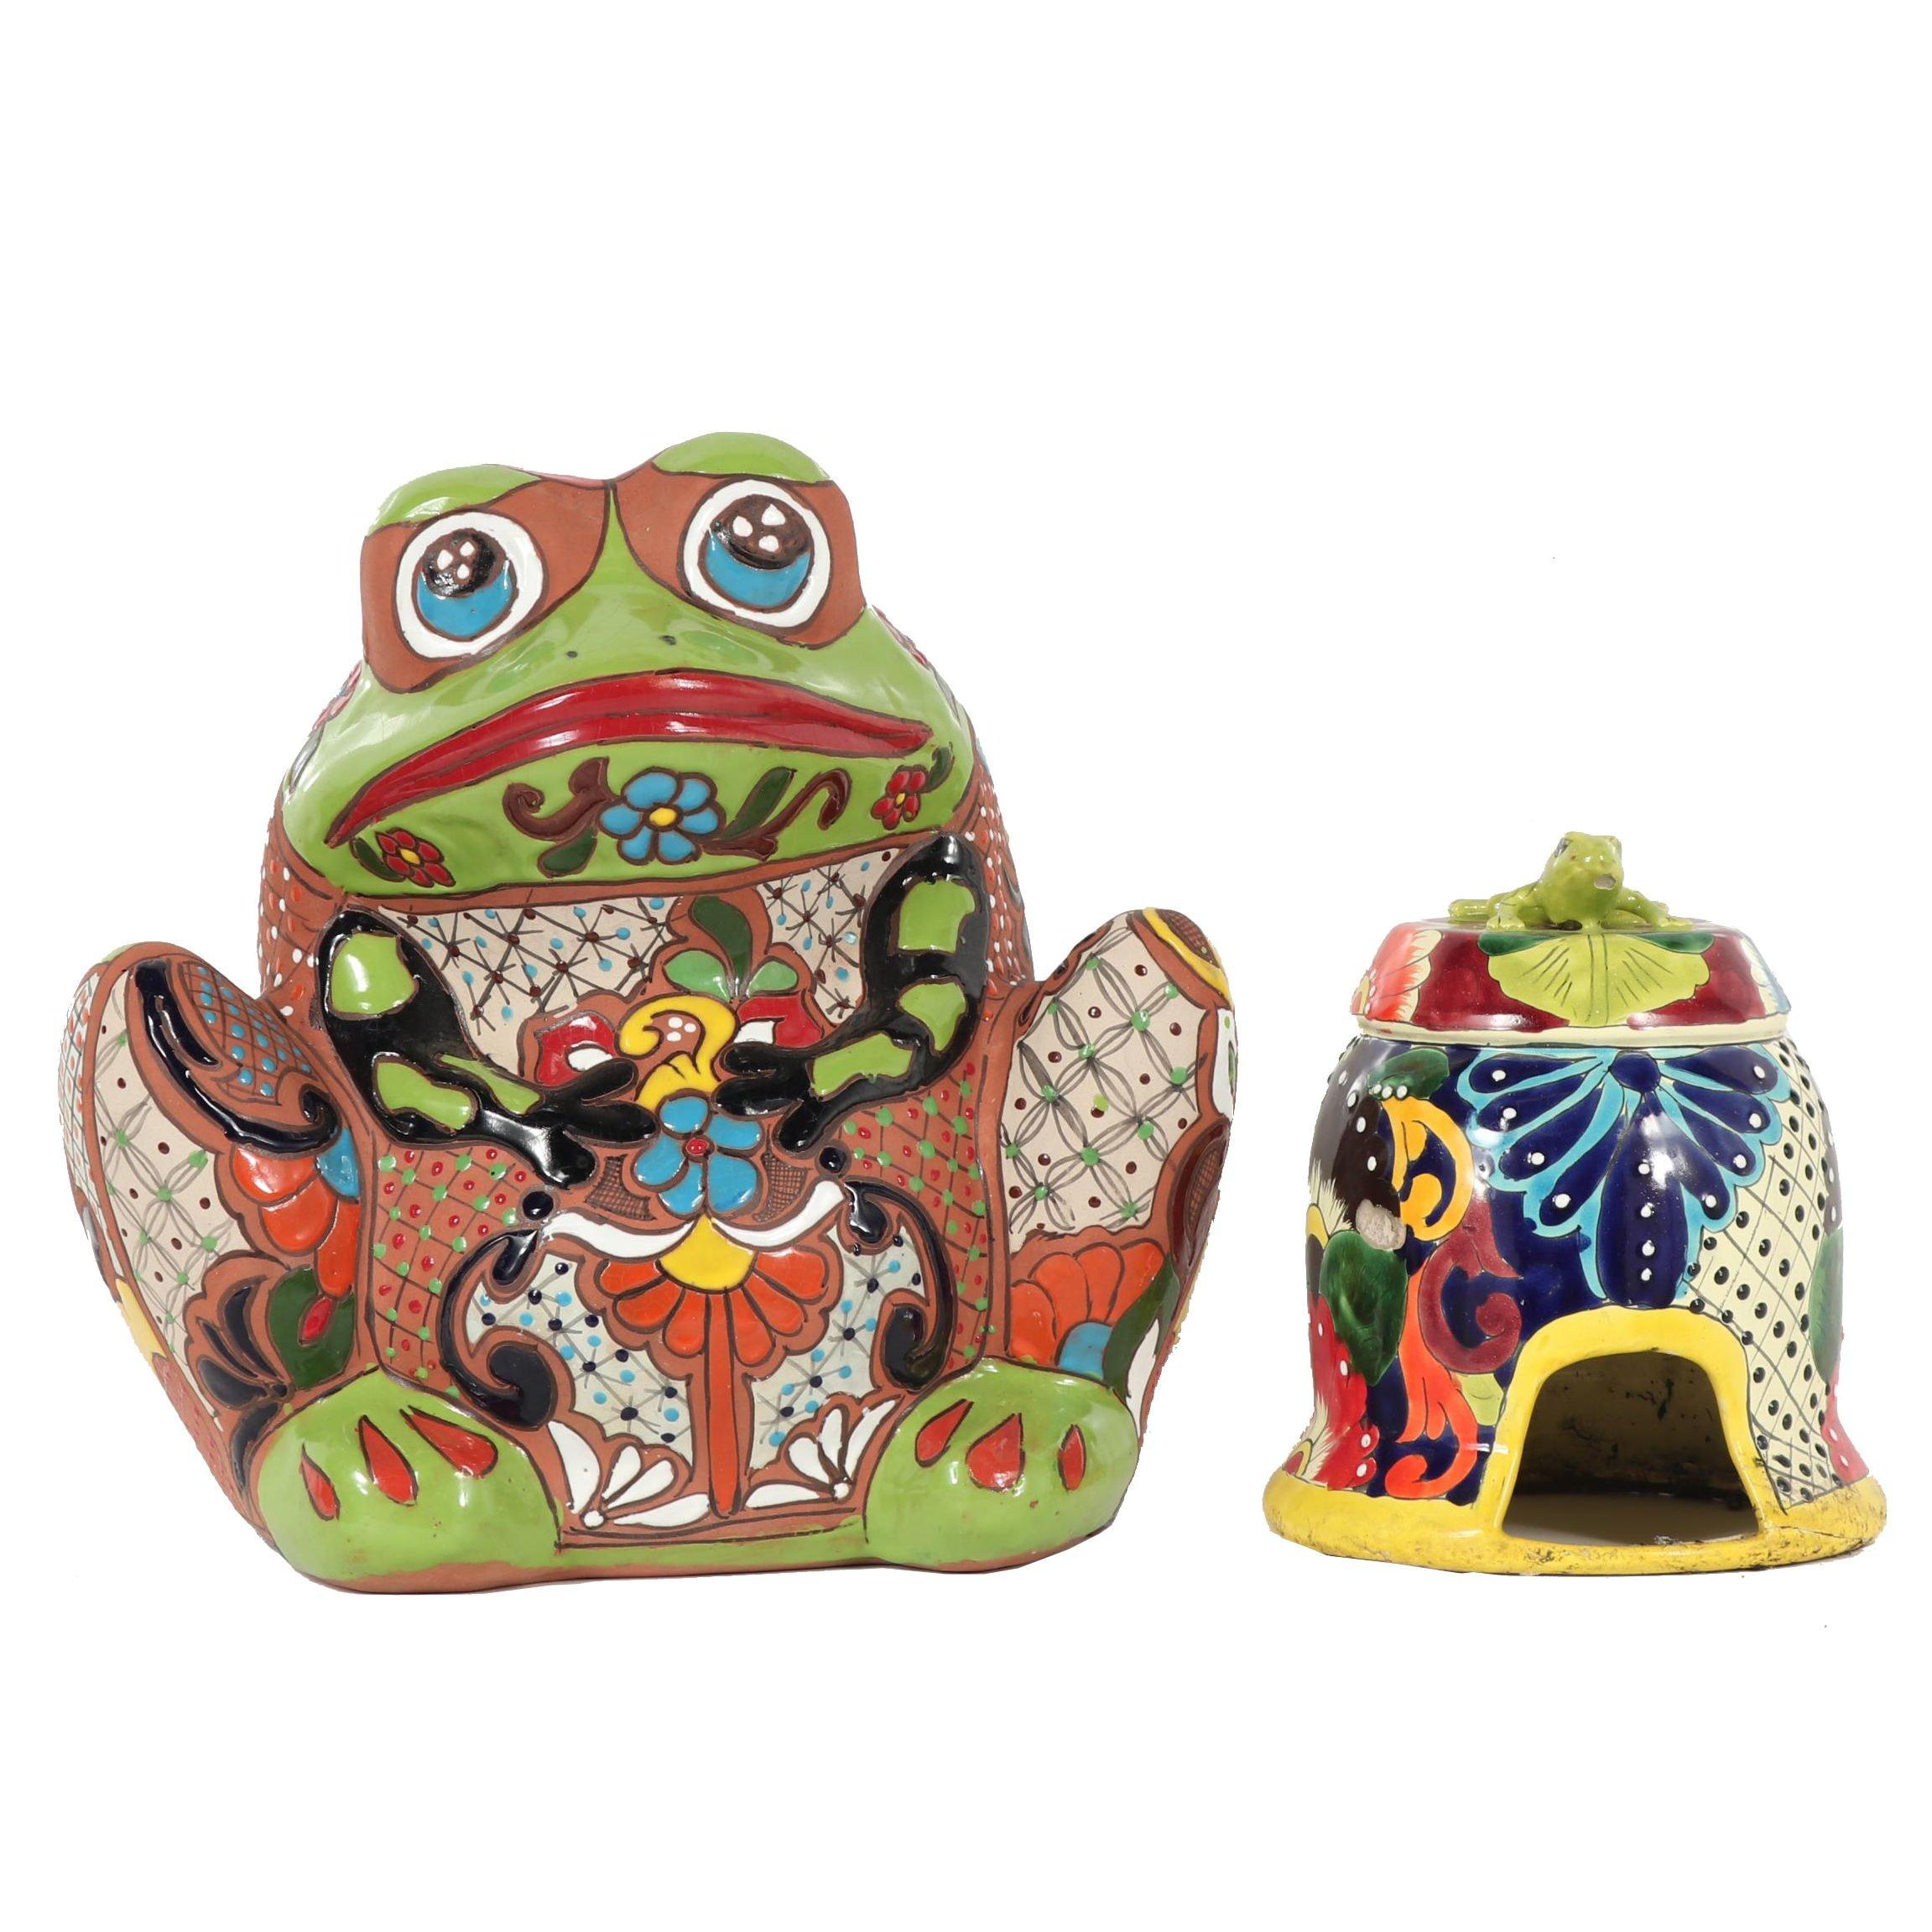 Ceramic Frog Planter and Lawn Decor